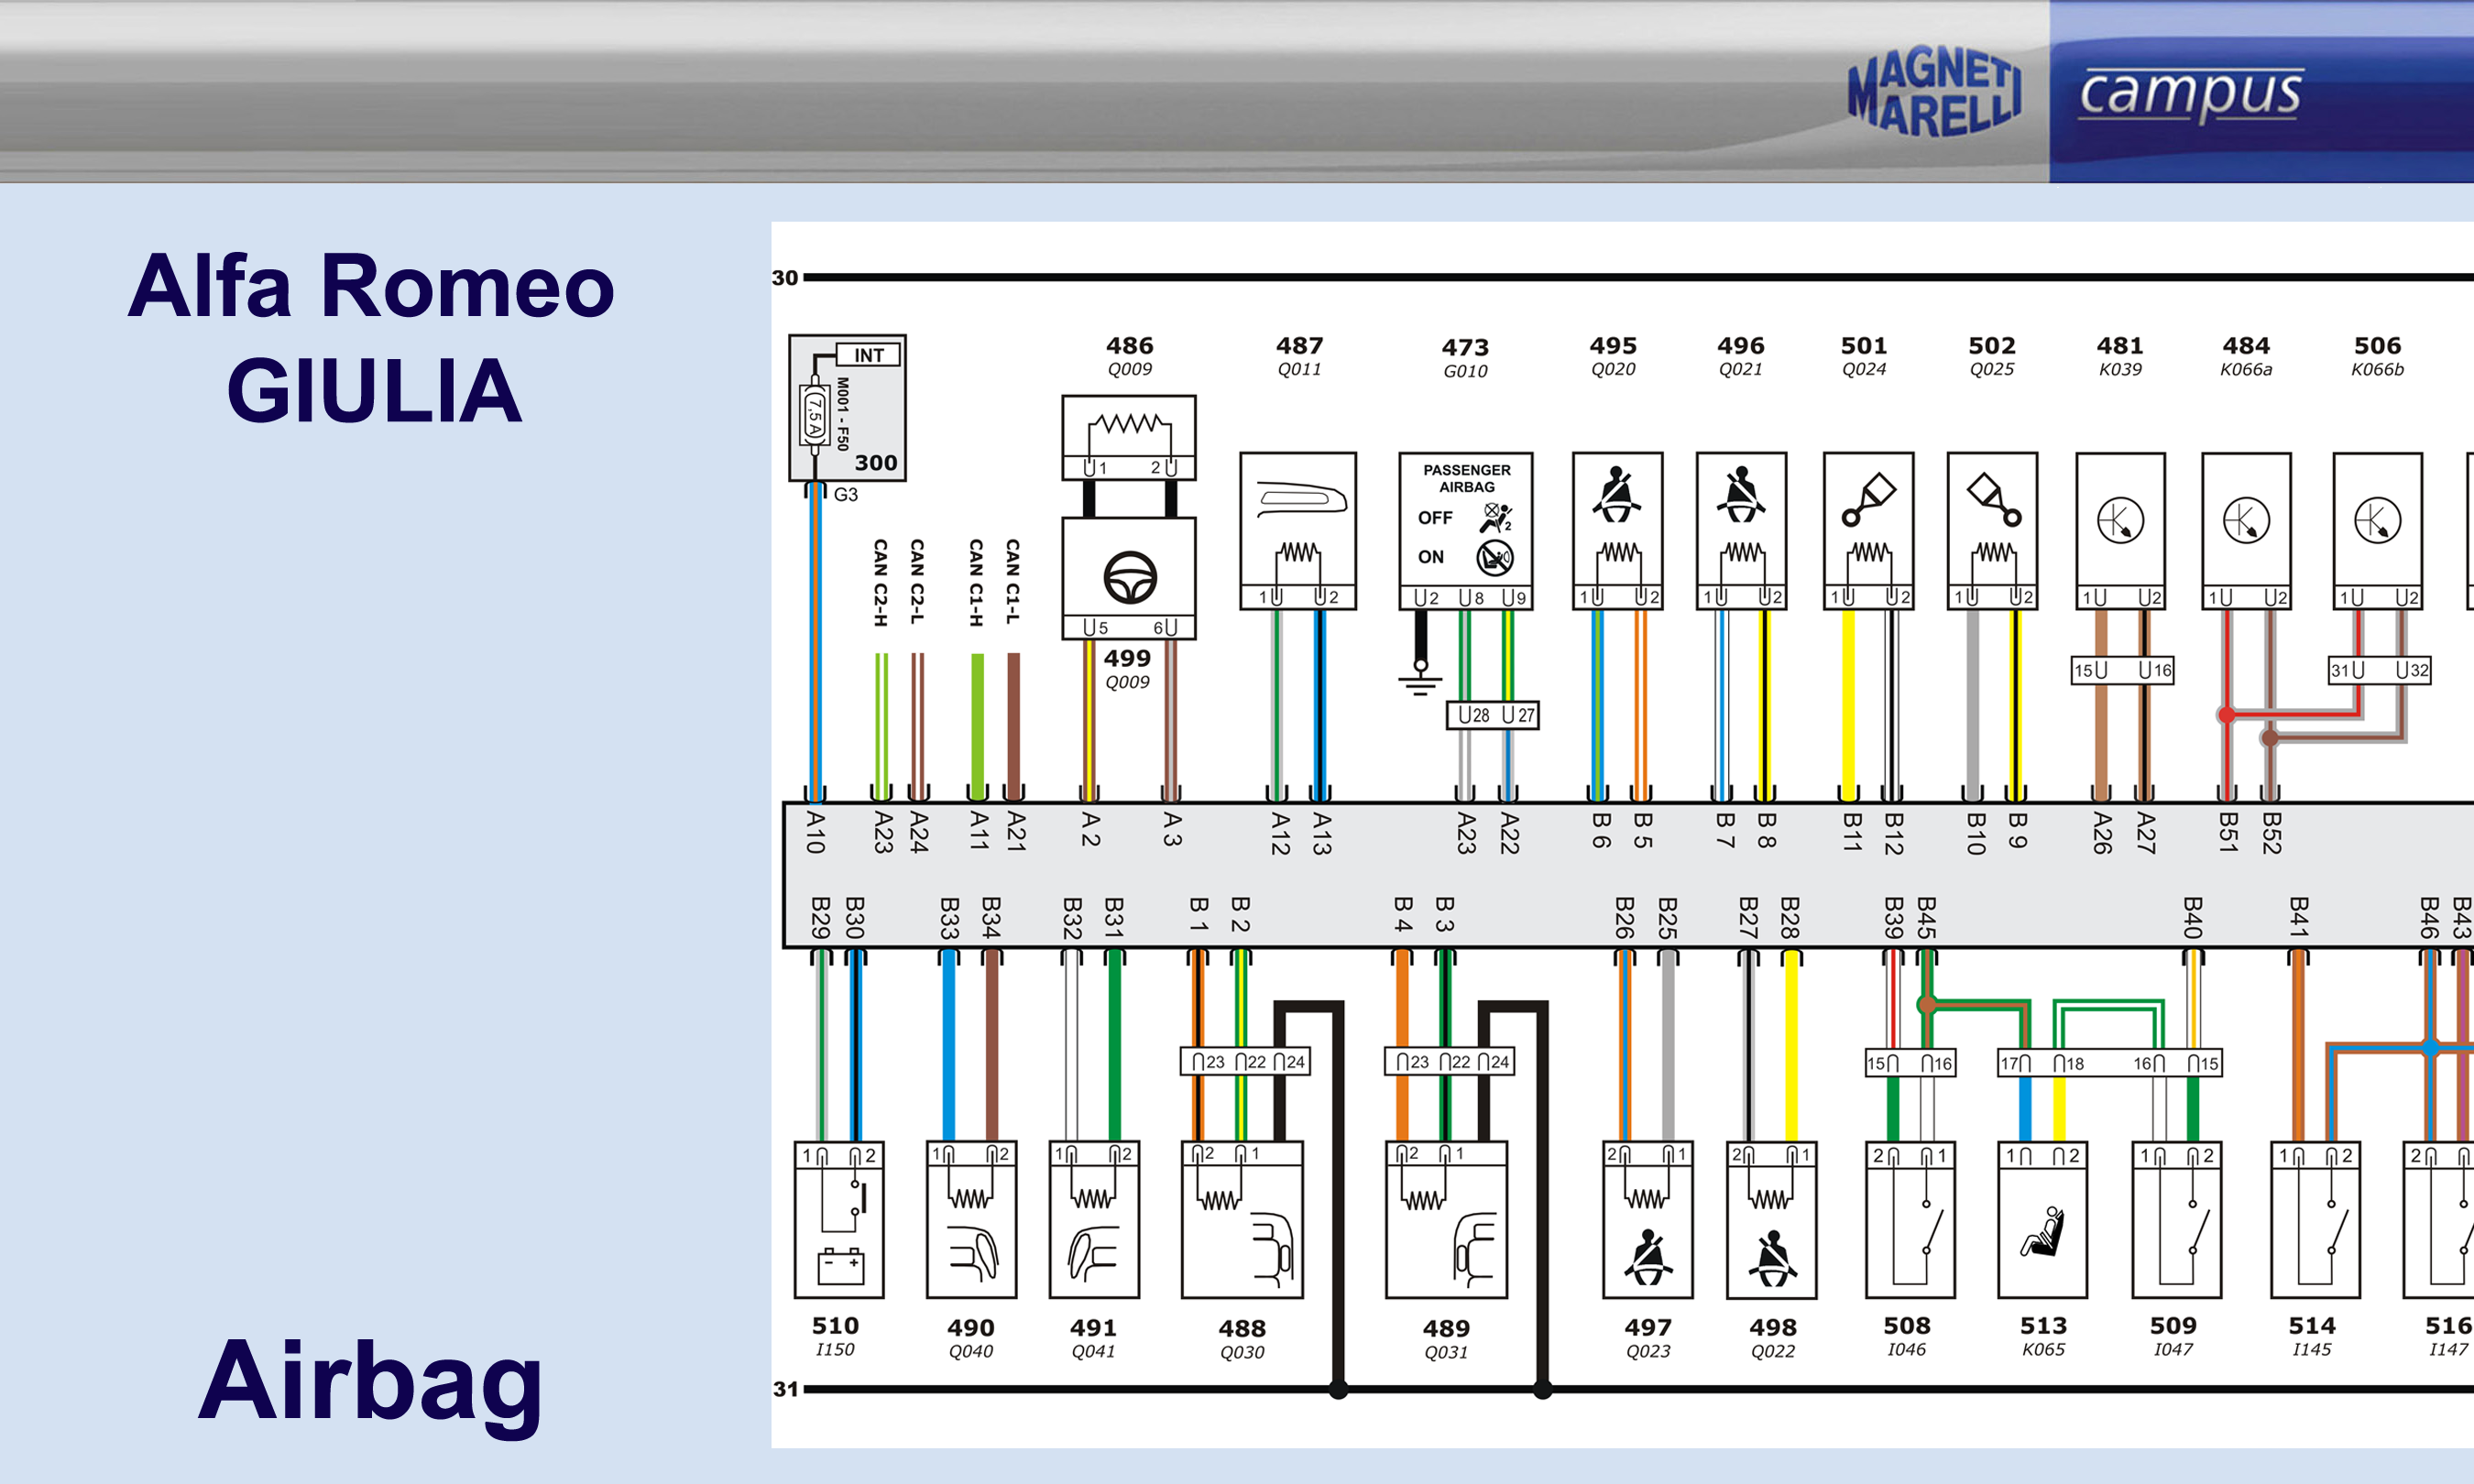 Schema Elettrico Giulietta 2010 : Schema elettrico alfa romeo giulietta schemat elektryczny